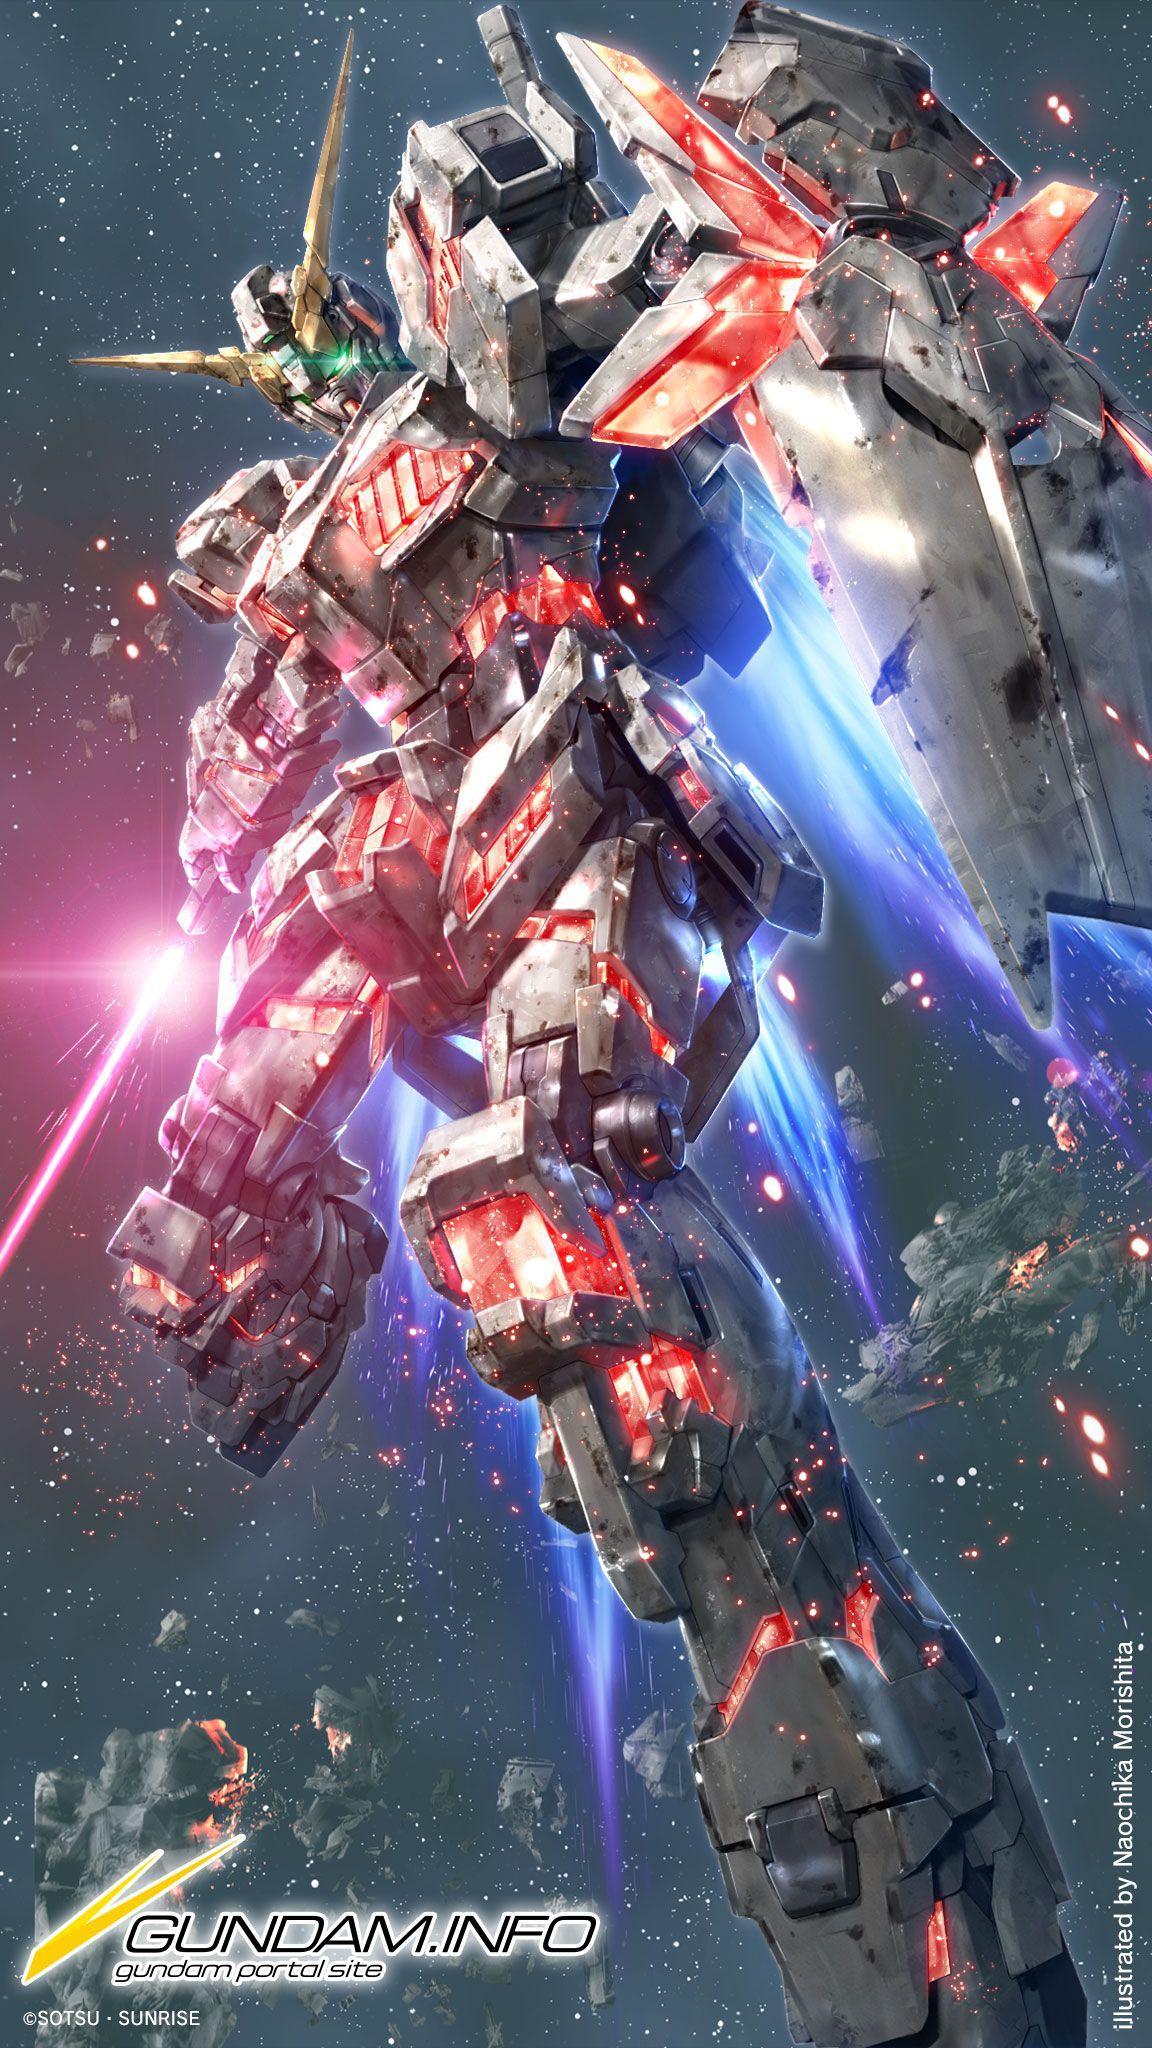 Gundam Unicorn wallpaper The official Gundam news and